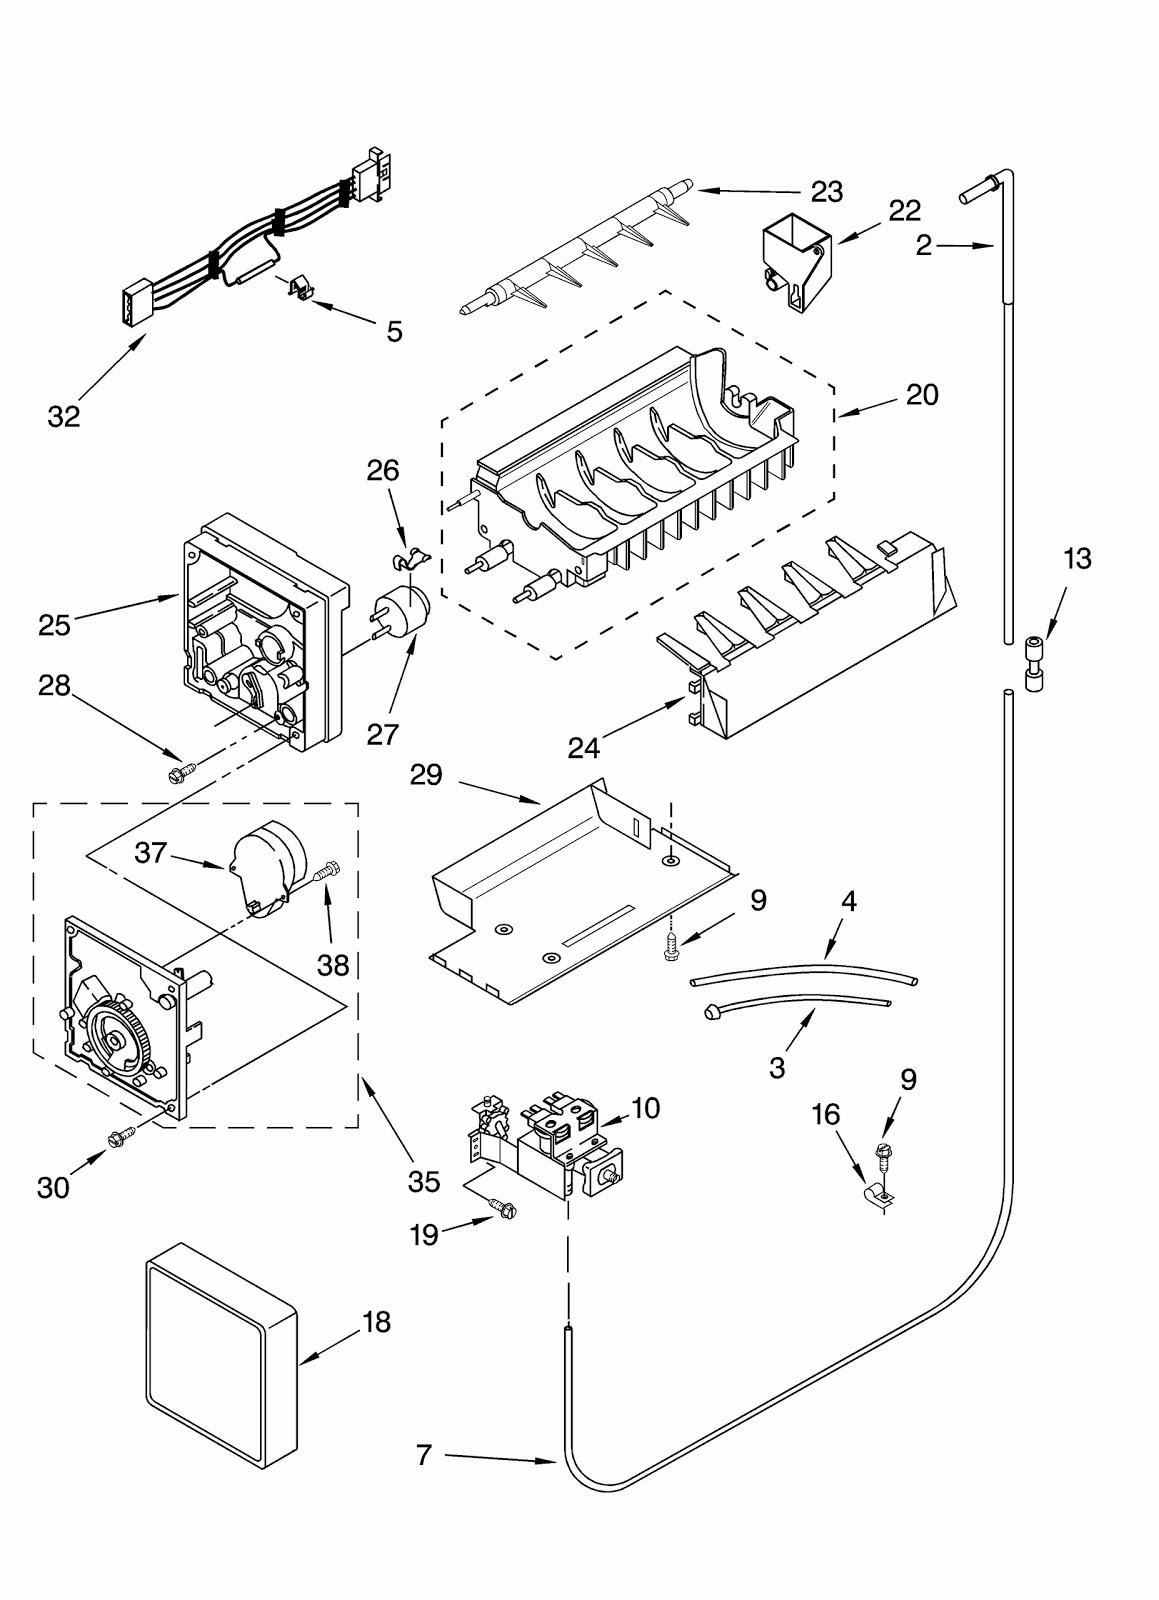 wireing diagram ice maker whirlpool